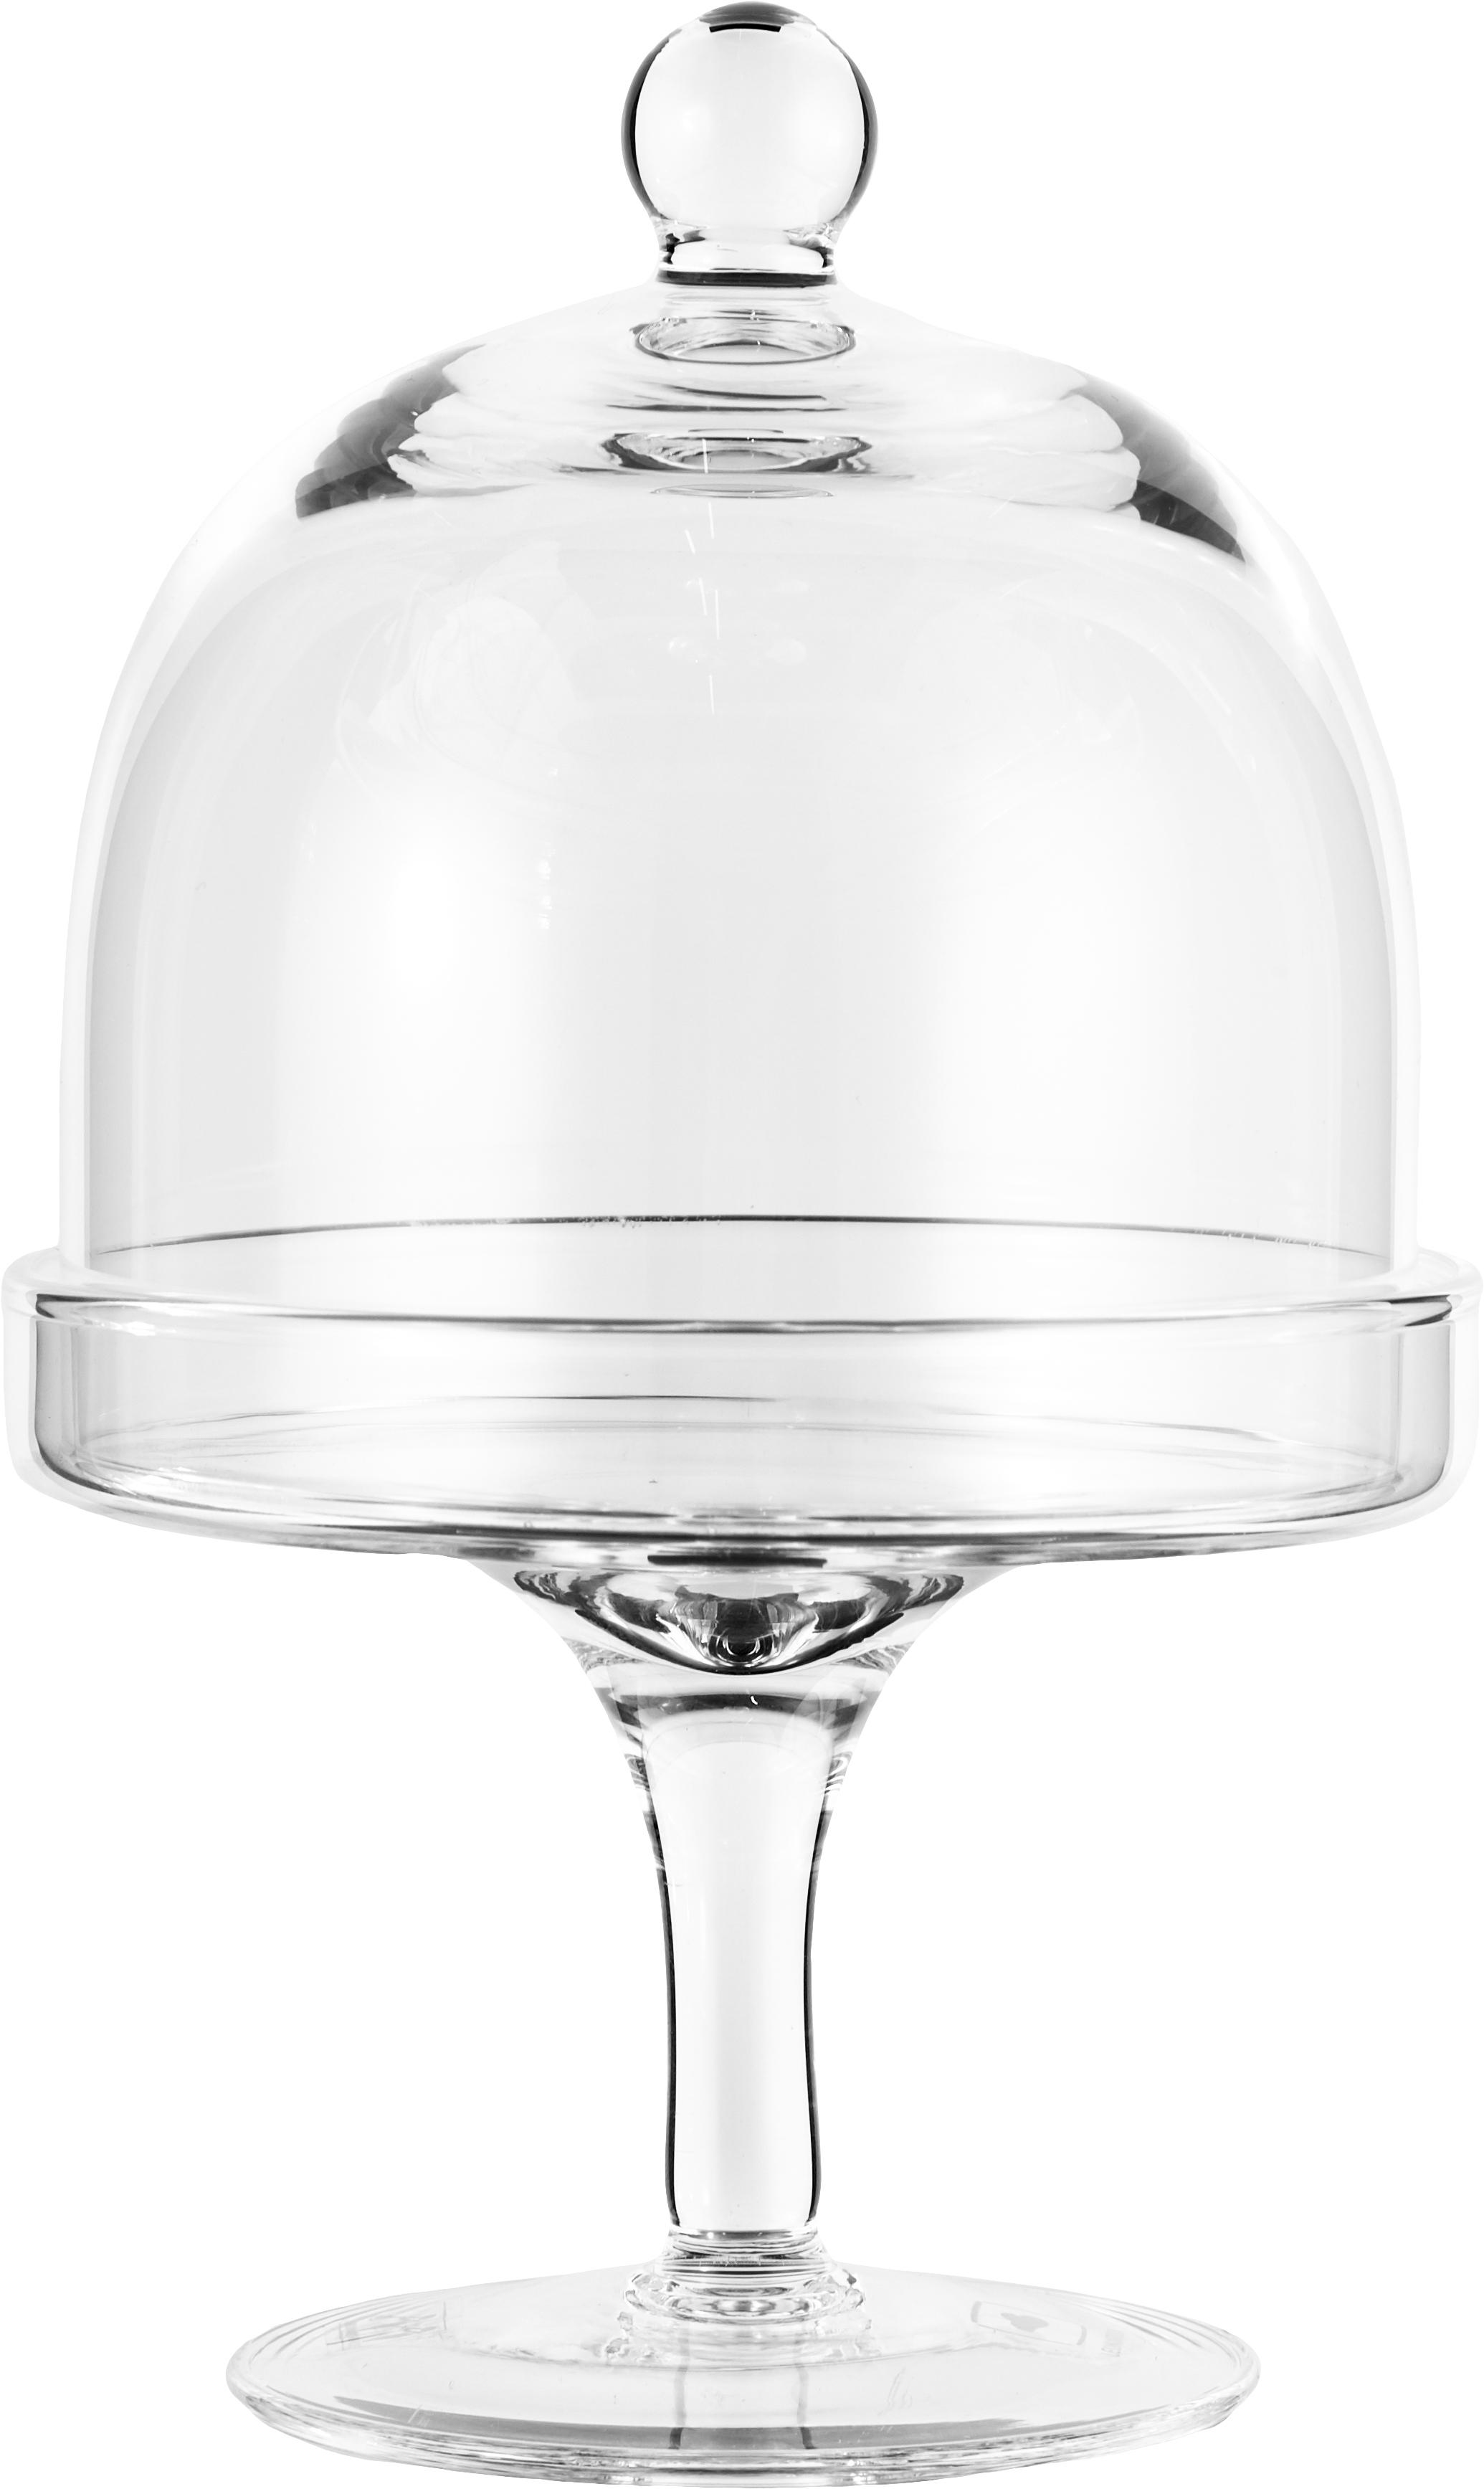 XS taartplateau Dolce, Glas, Transparant, H 20 cm